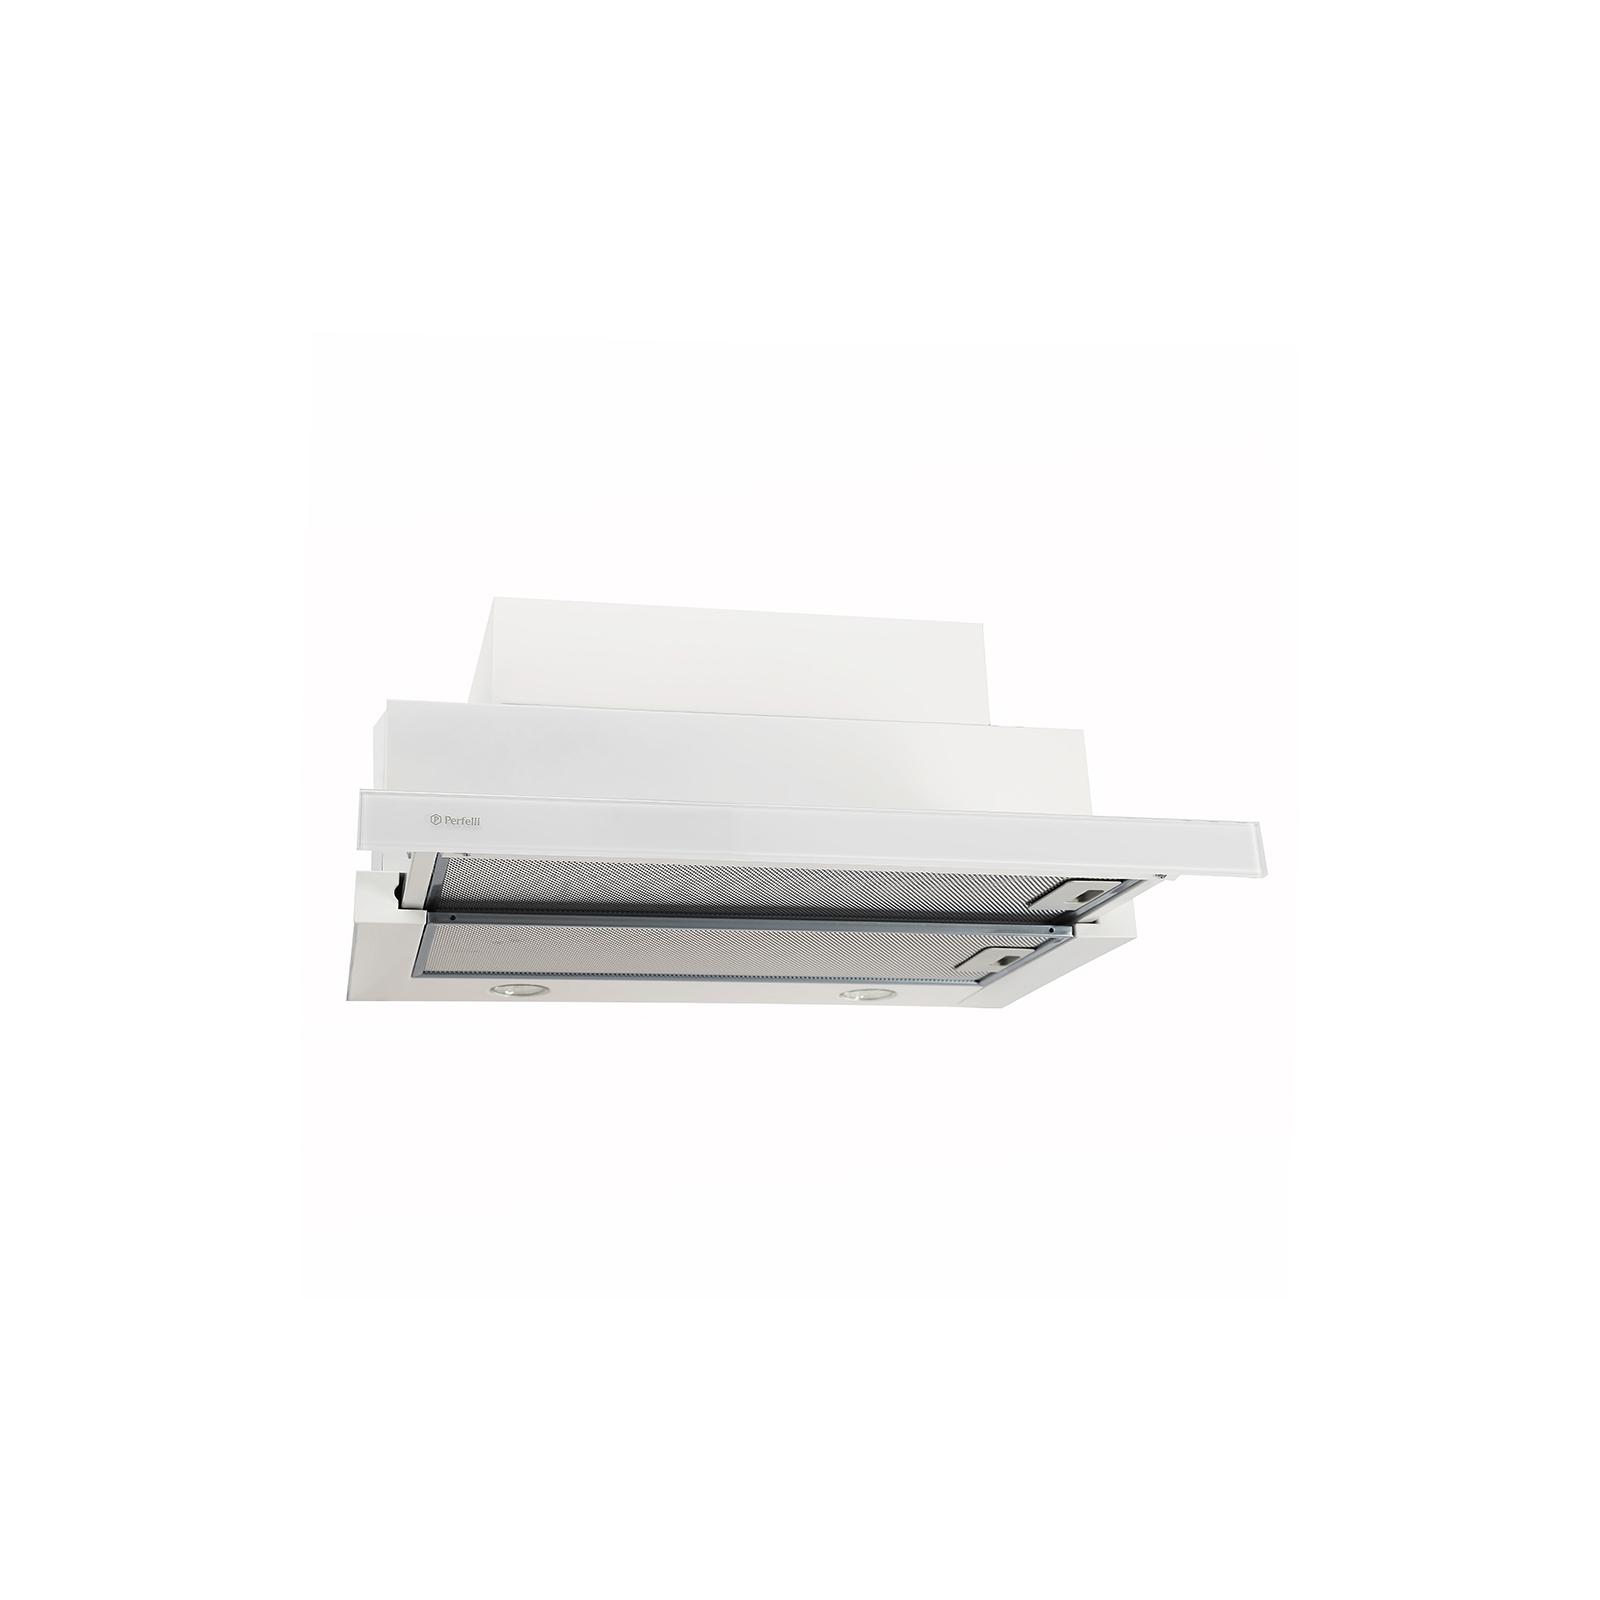 Вытяжка кухонная PERFELLI TLS 6832 W LED изображение 3